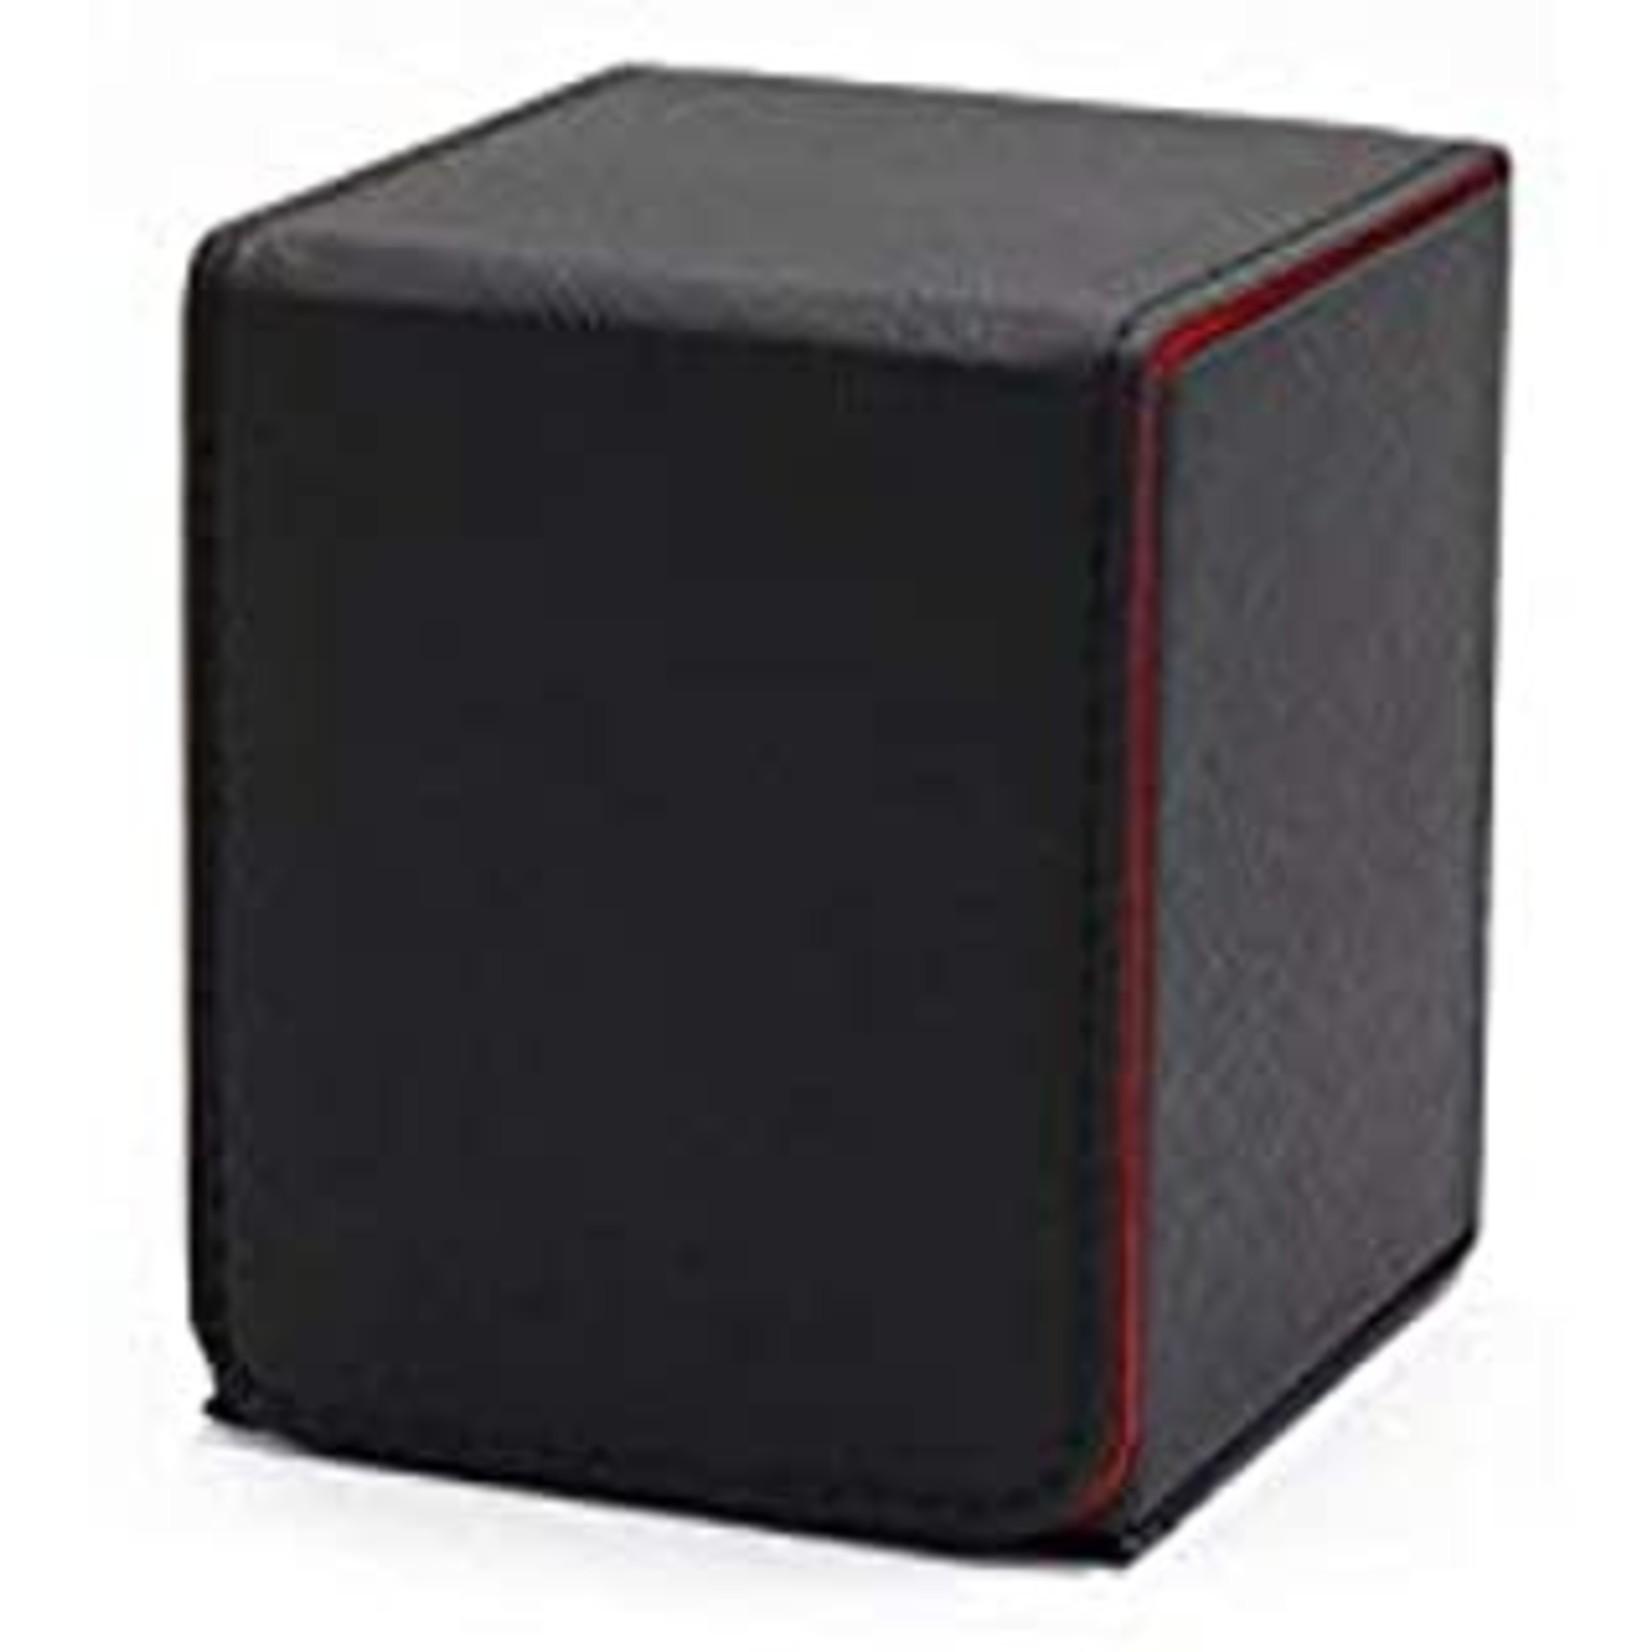 Dex Protection Dex Creation Line Small Black 100ct